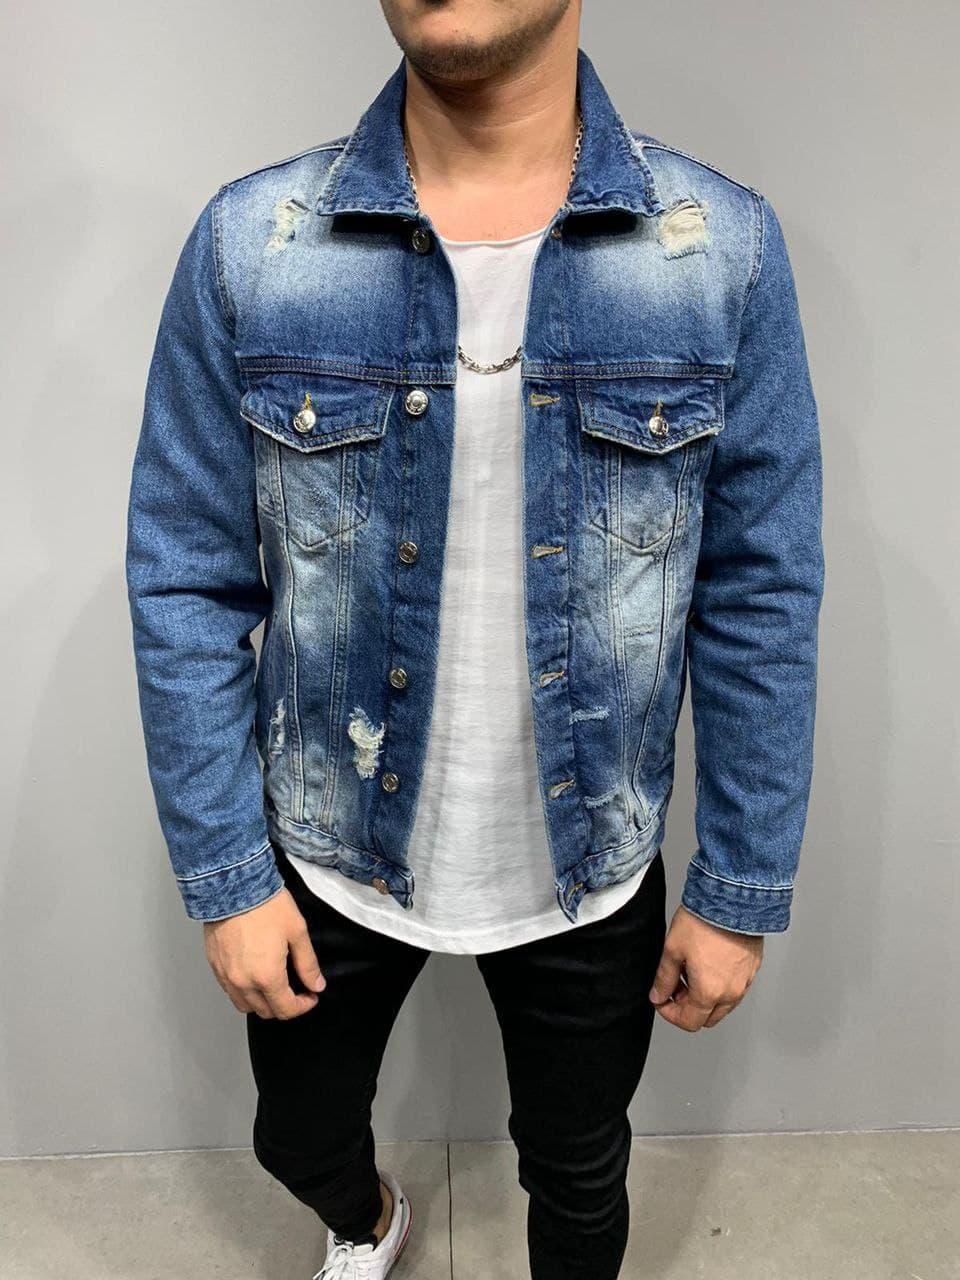 Куртка мужская джинсовая синяя выбеленная рваная